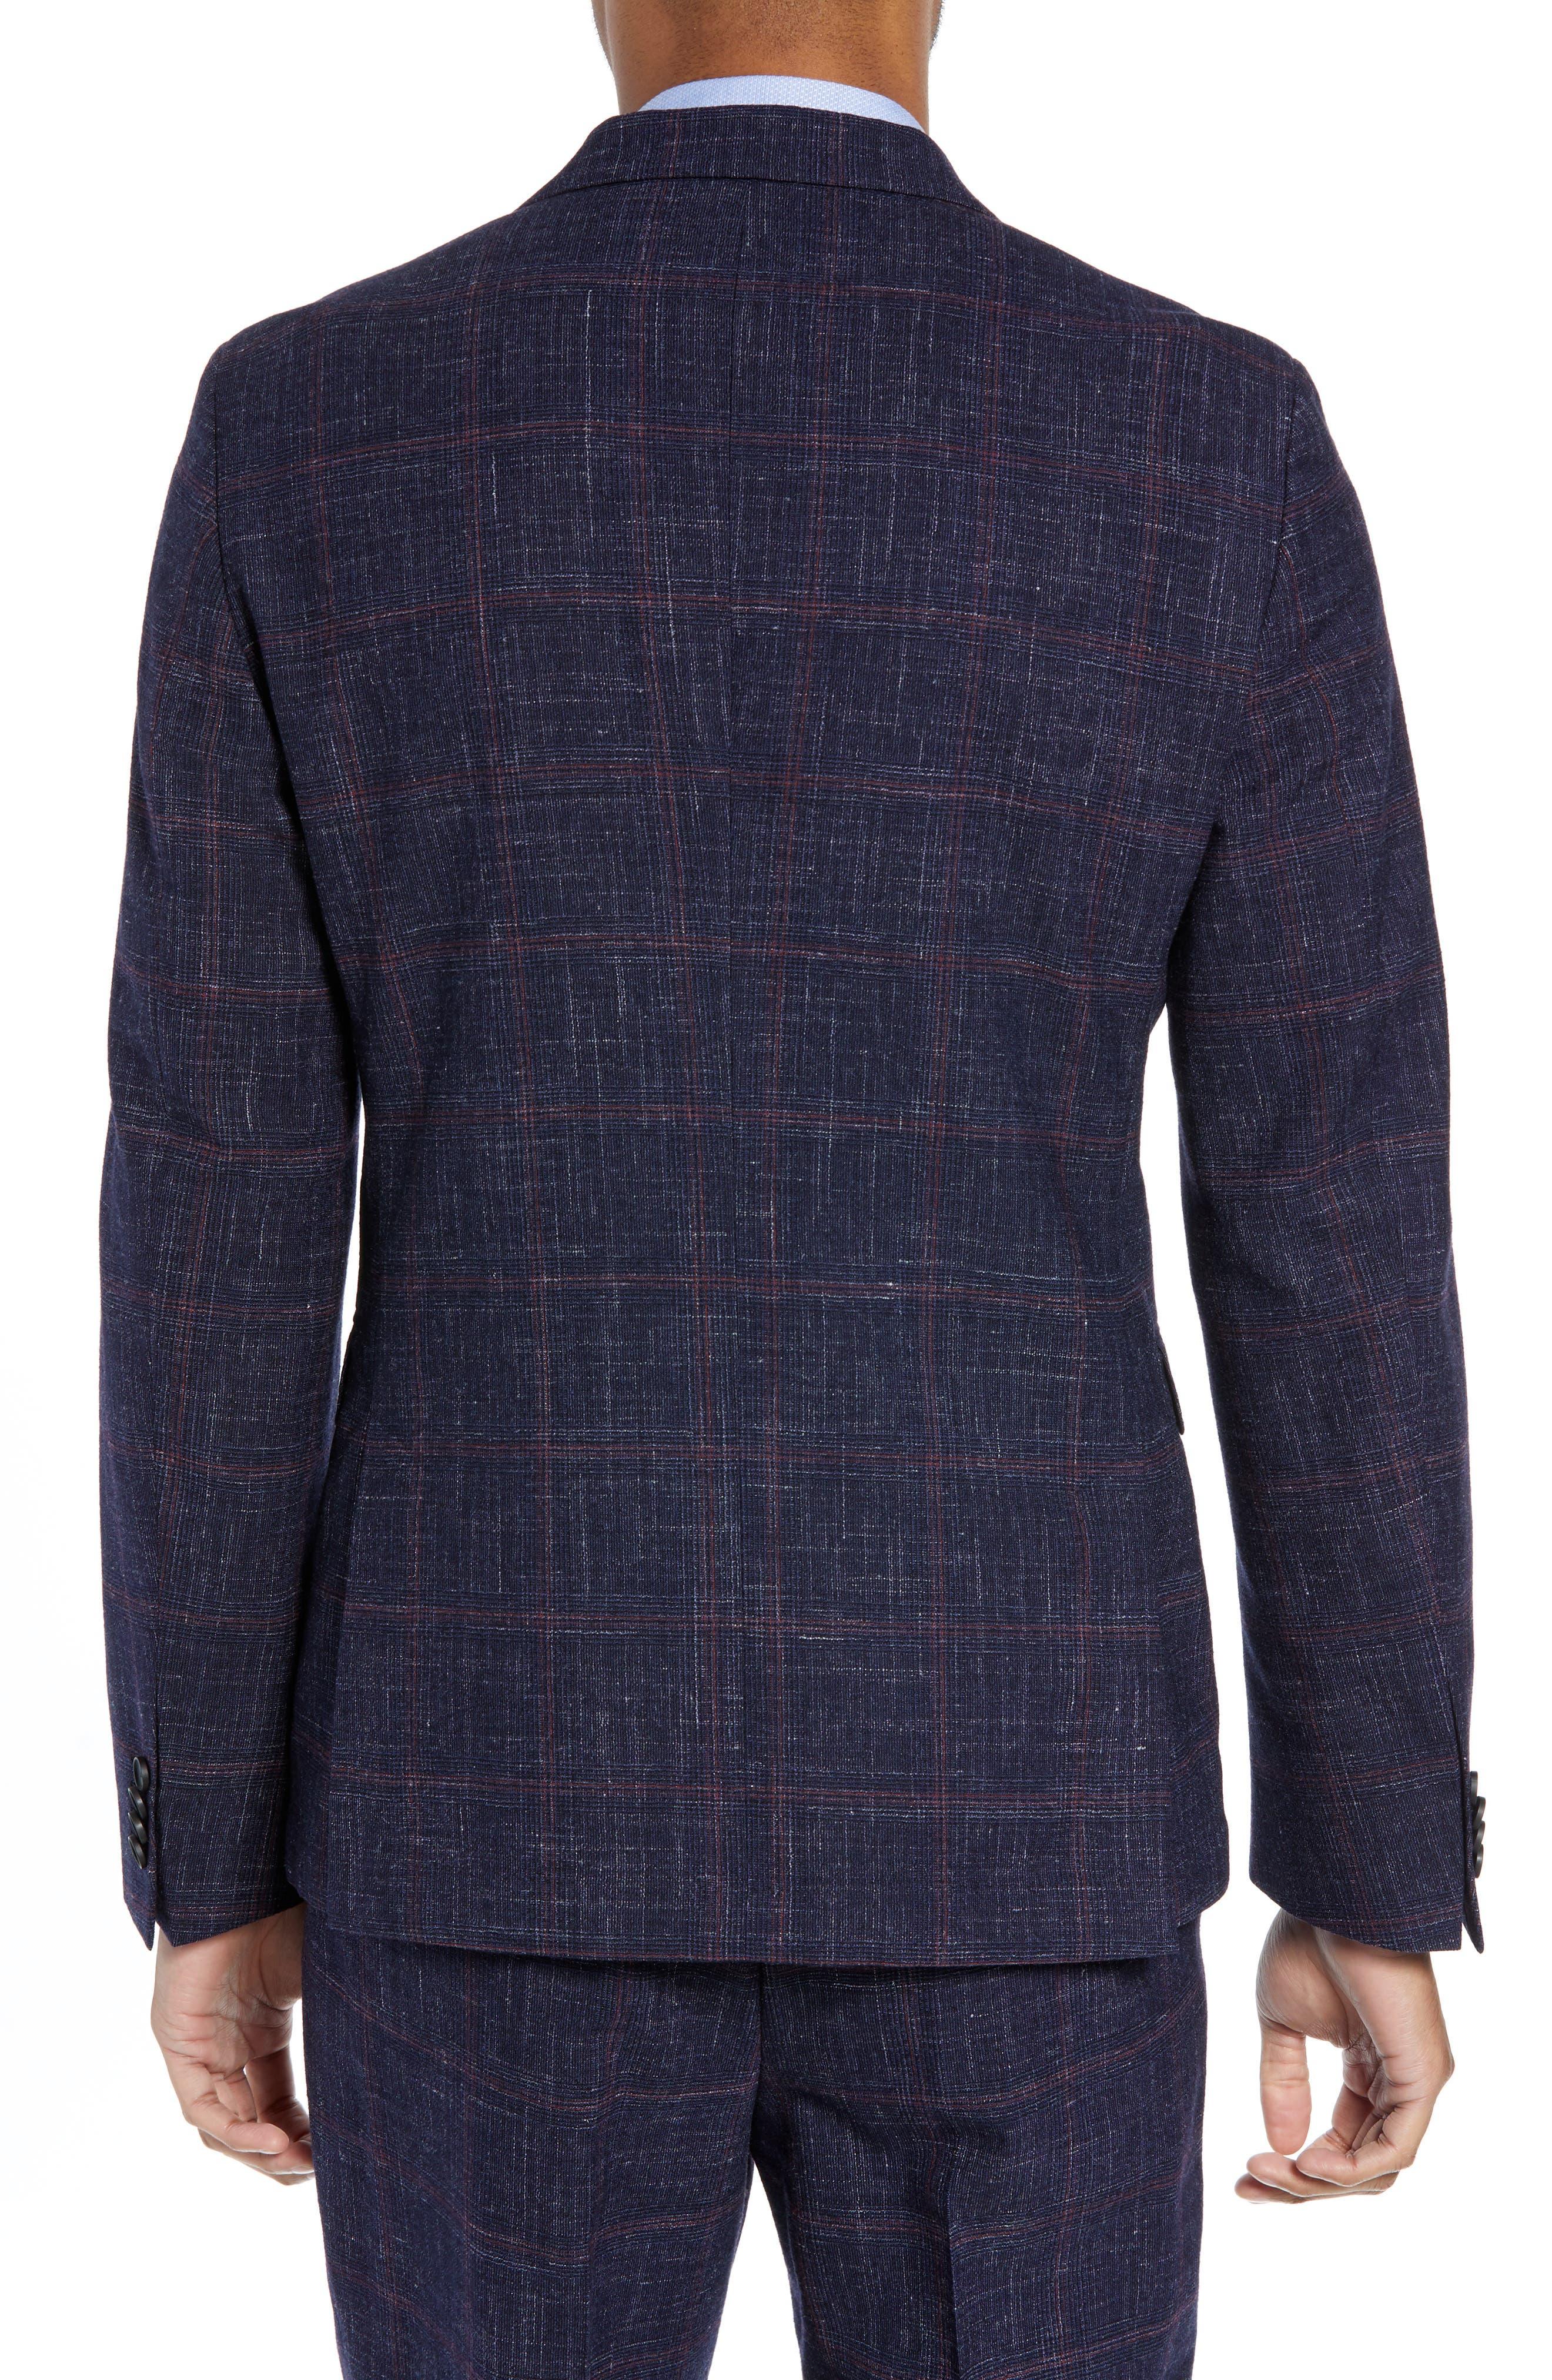 Nobis Trim Fit Plaid Wool Blend Sport Coat,                             Alternate thumbnail 2, color,                             DARK BLUE